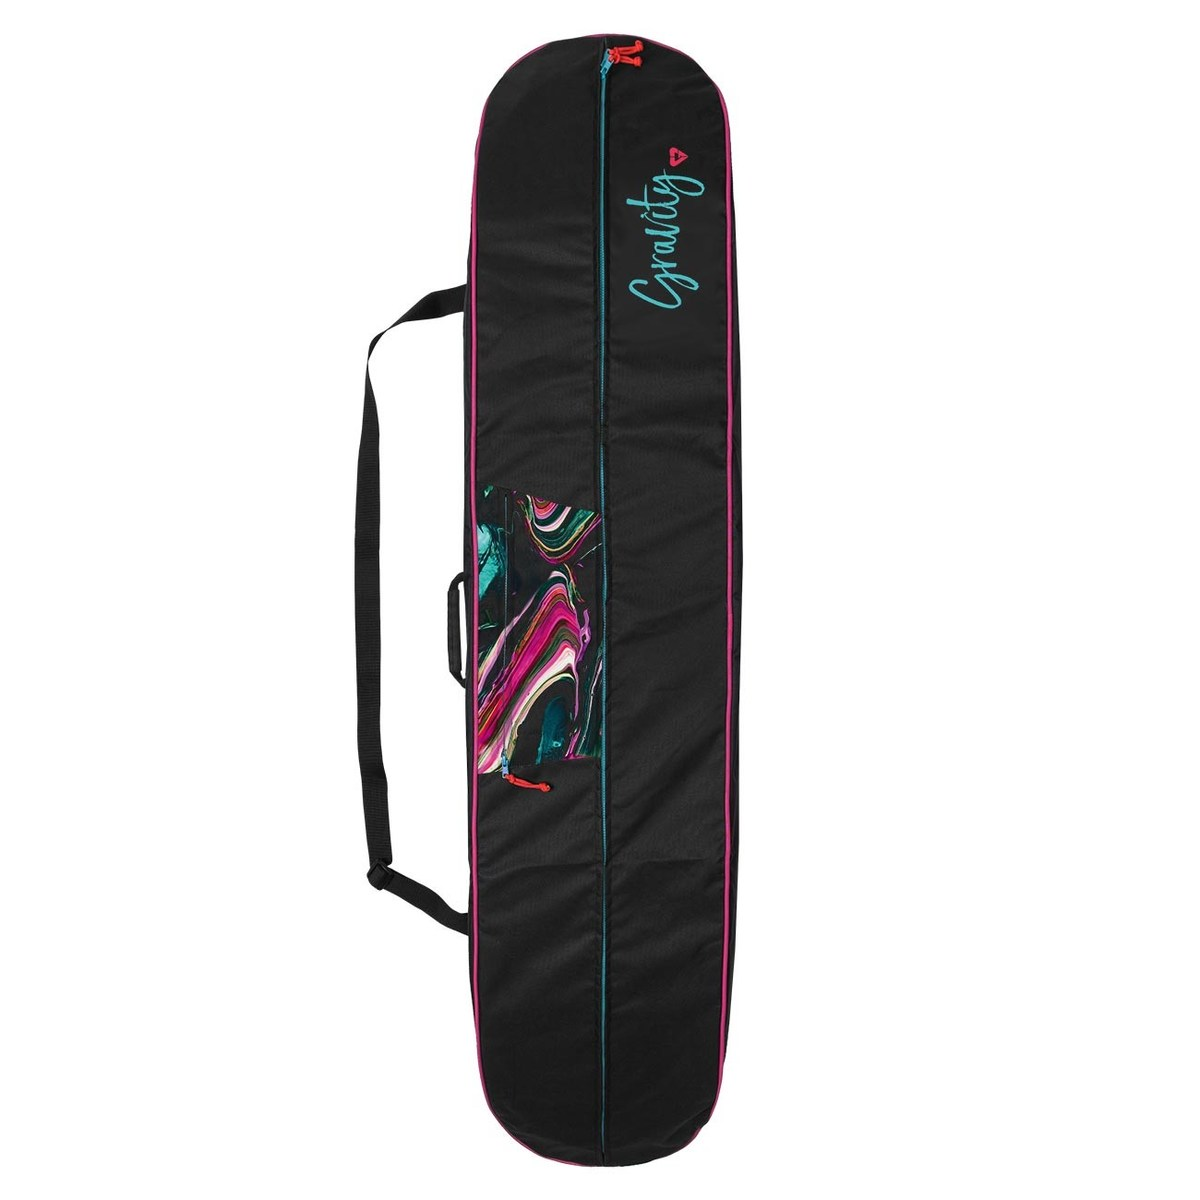 Obal na snowboard Gravity Rainbow 18/19 160 cm